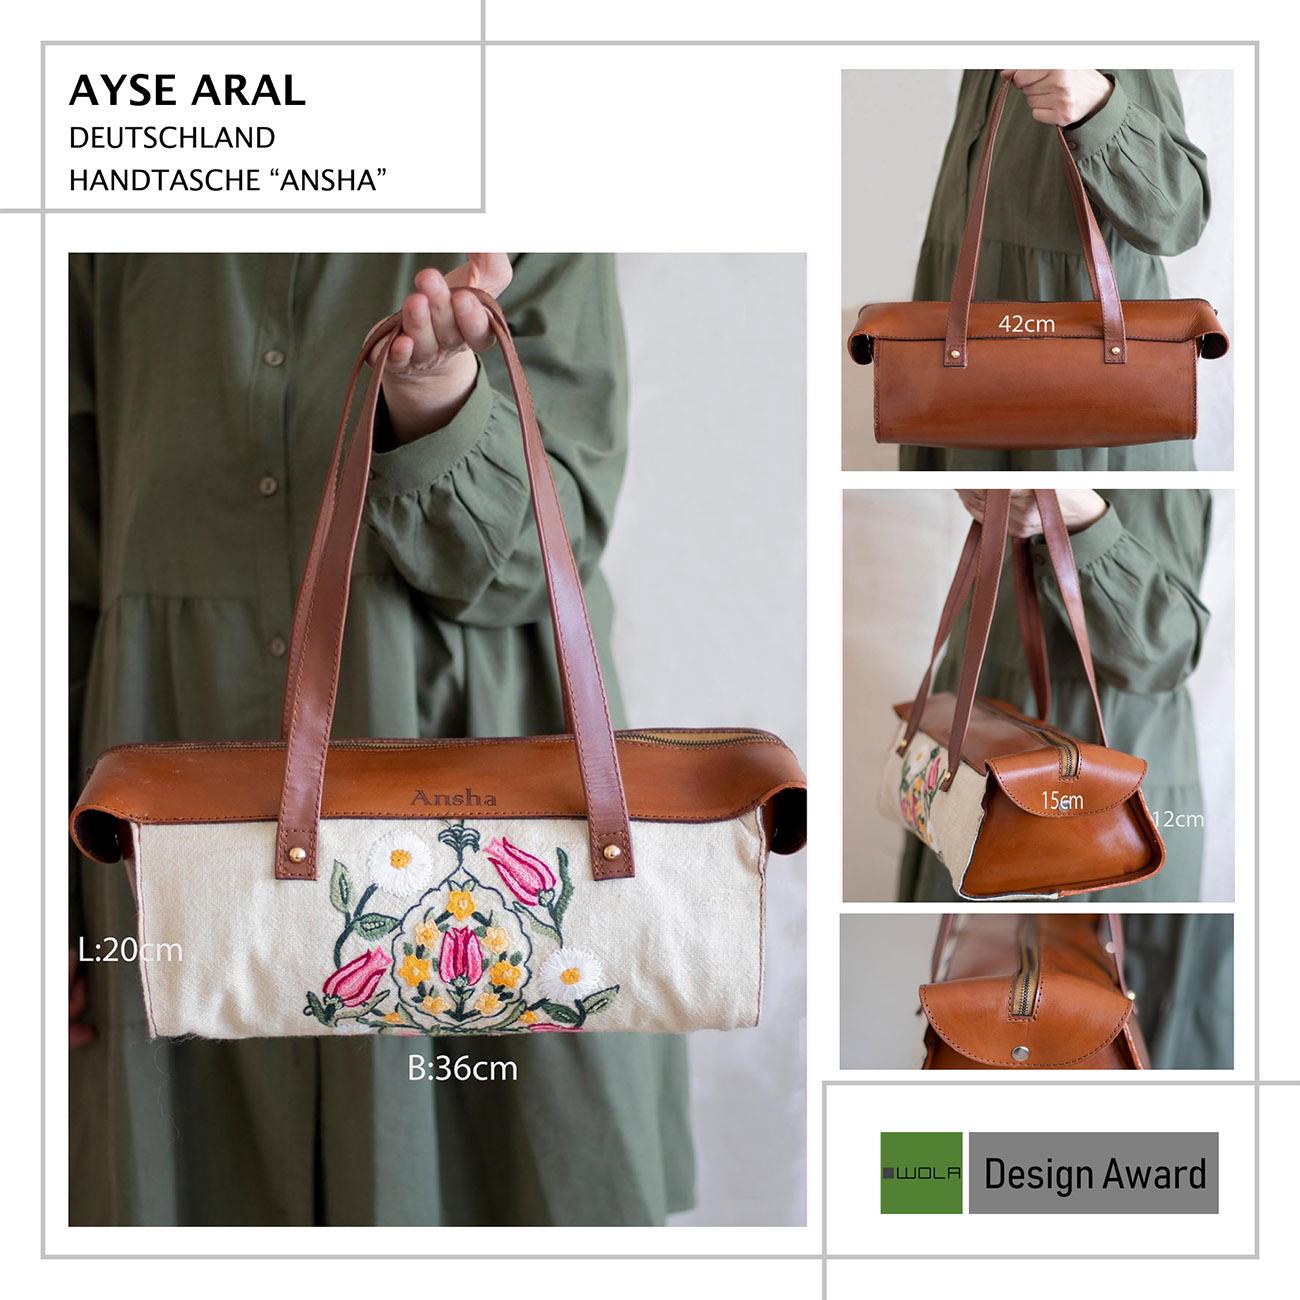 AYSE ARAL WOLA Design Wettbewerb 2021  -4